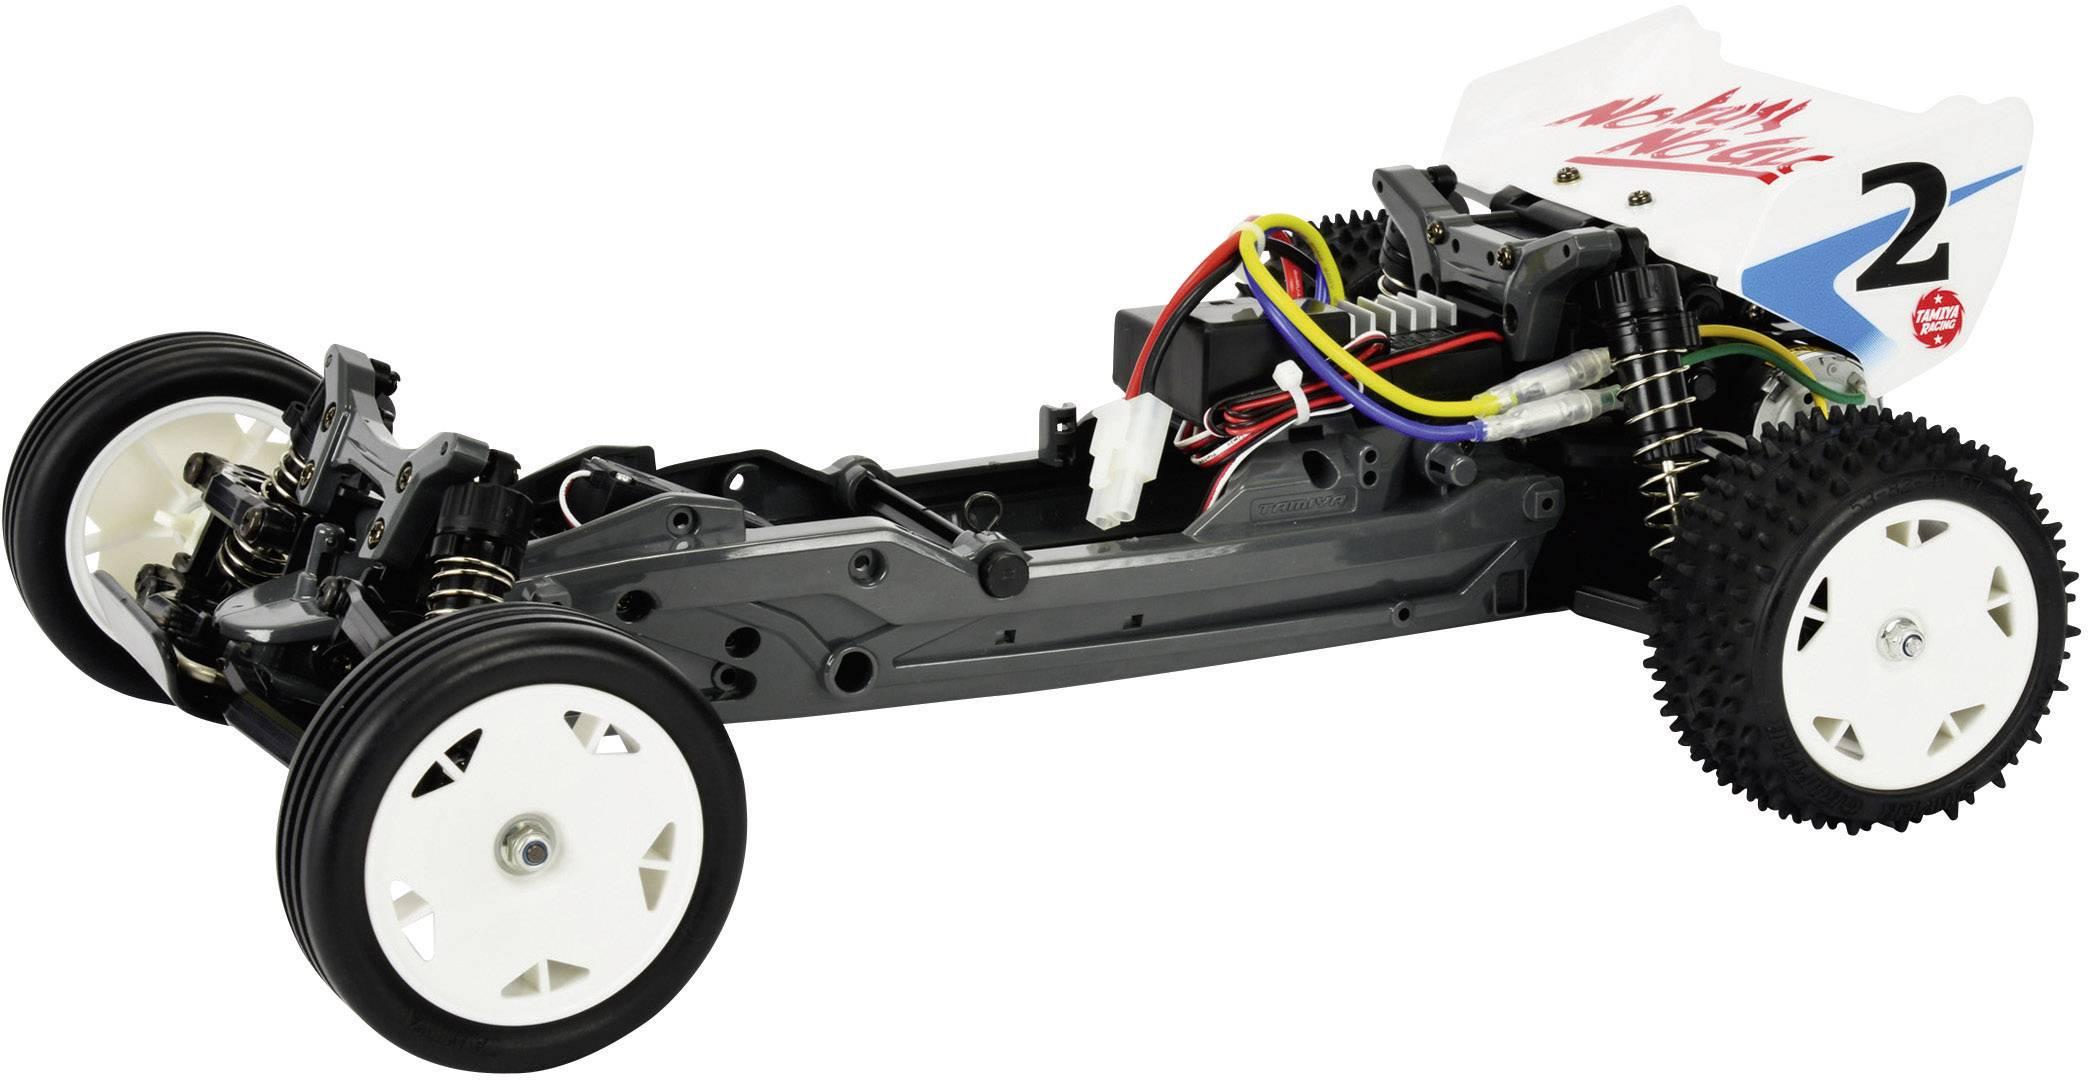 Automodello Tamiya Neo Fighter Brushed 110 Buggy Elettrica Trazione posteriore In kit da costruire 2,4 GHz Kit